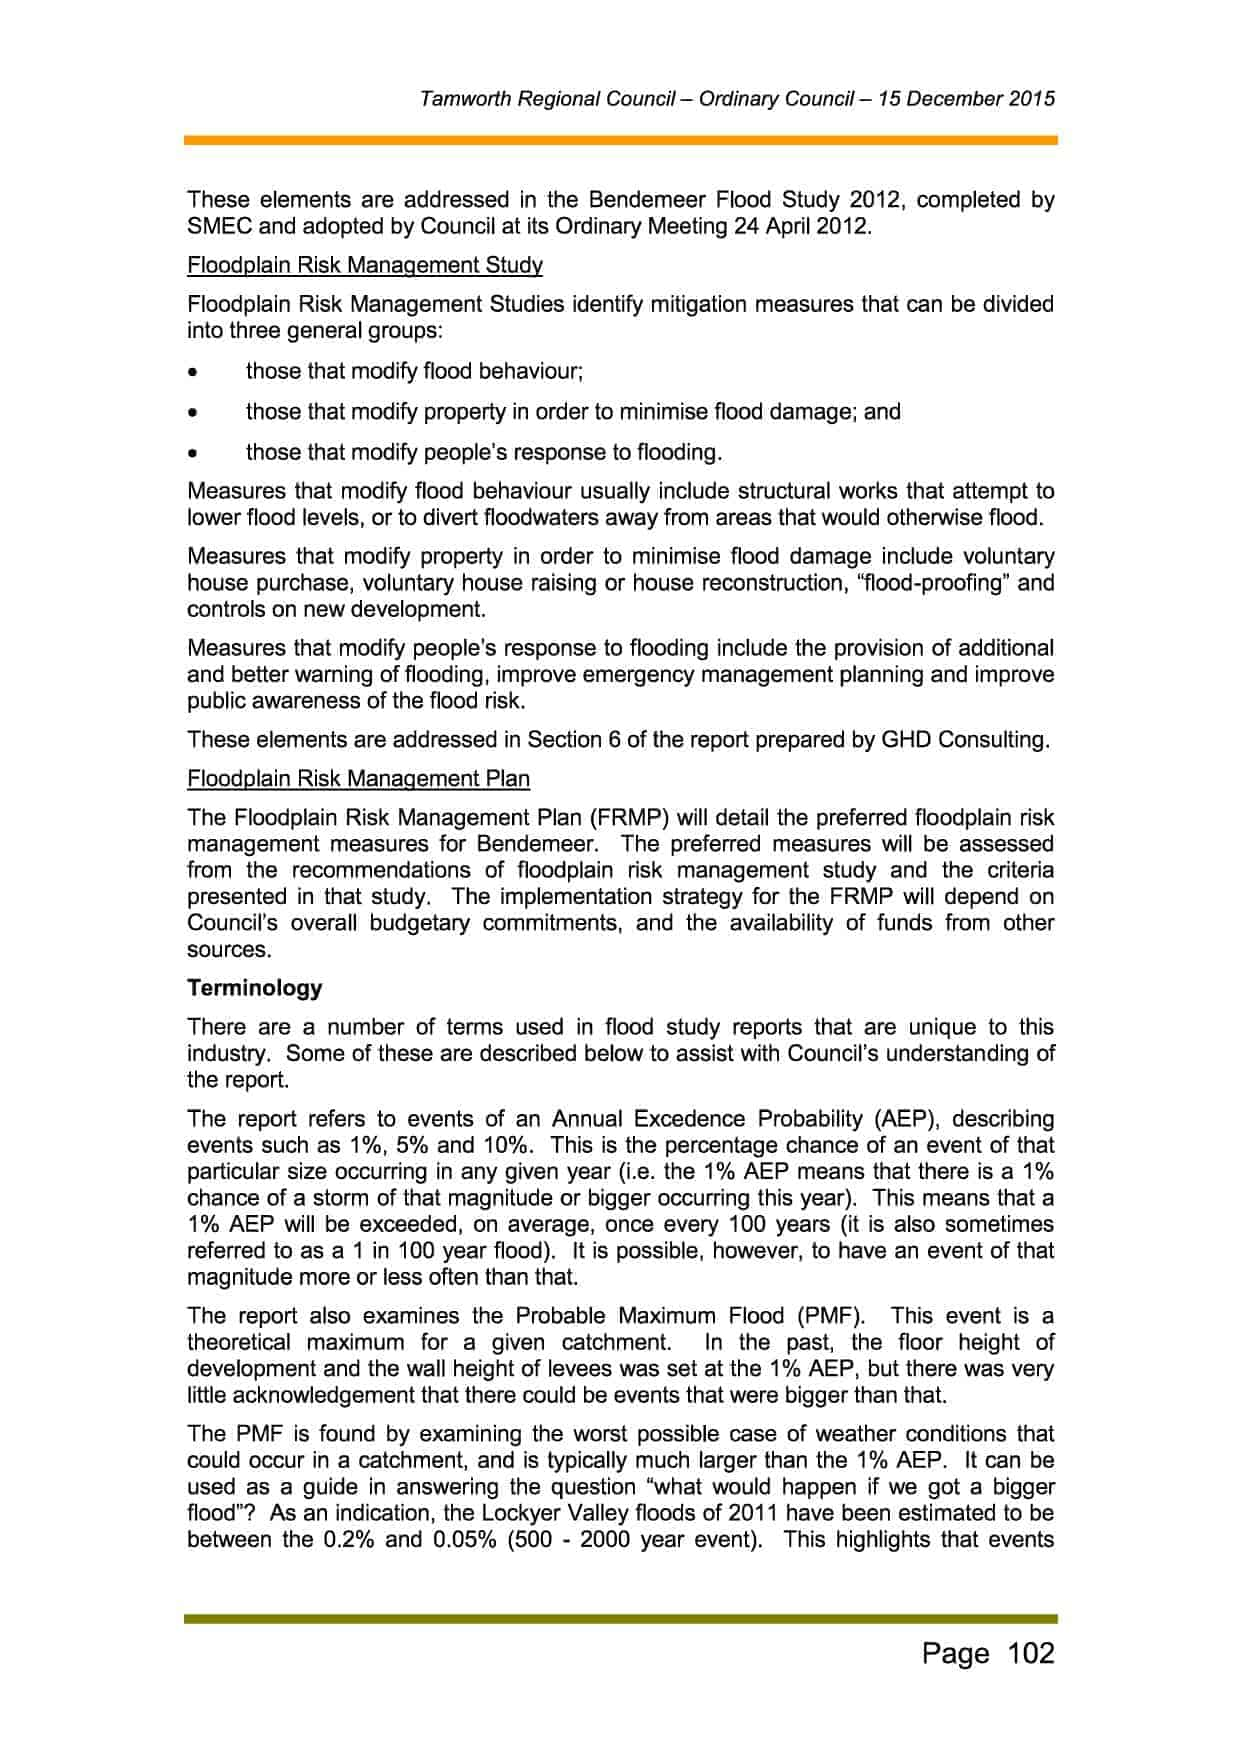 OPEN Business Paper - Ordinary Council 15 December 2015 (1)3